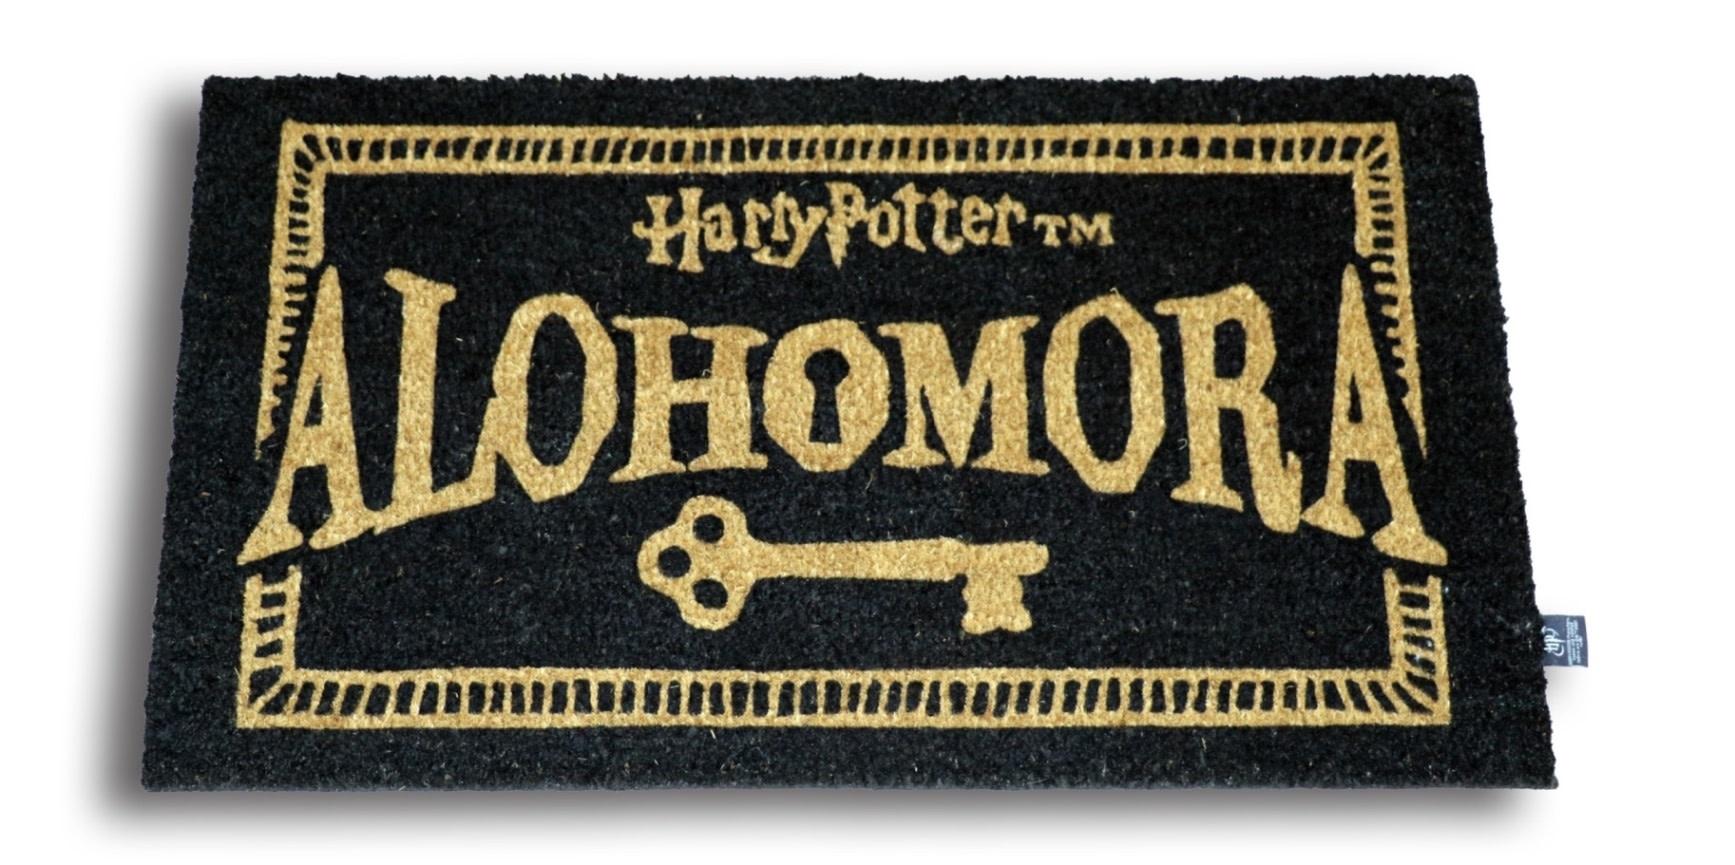 SD Toys Harry Potter: Alohomora Doormat